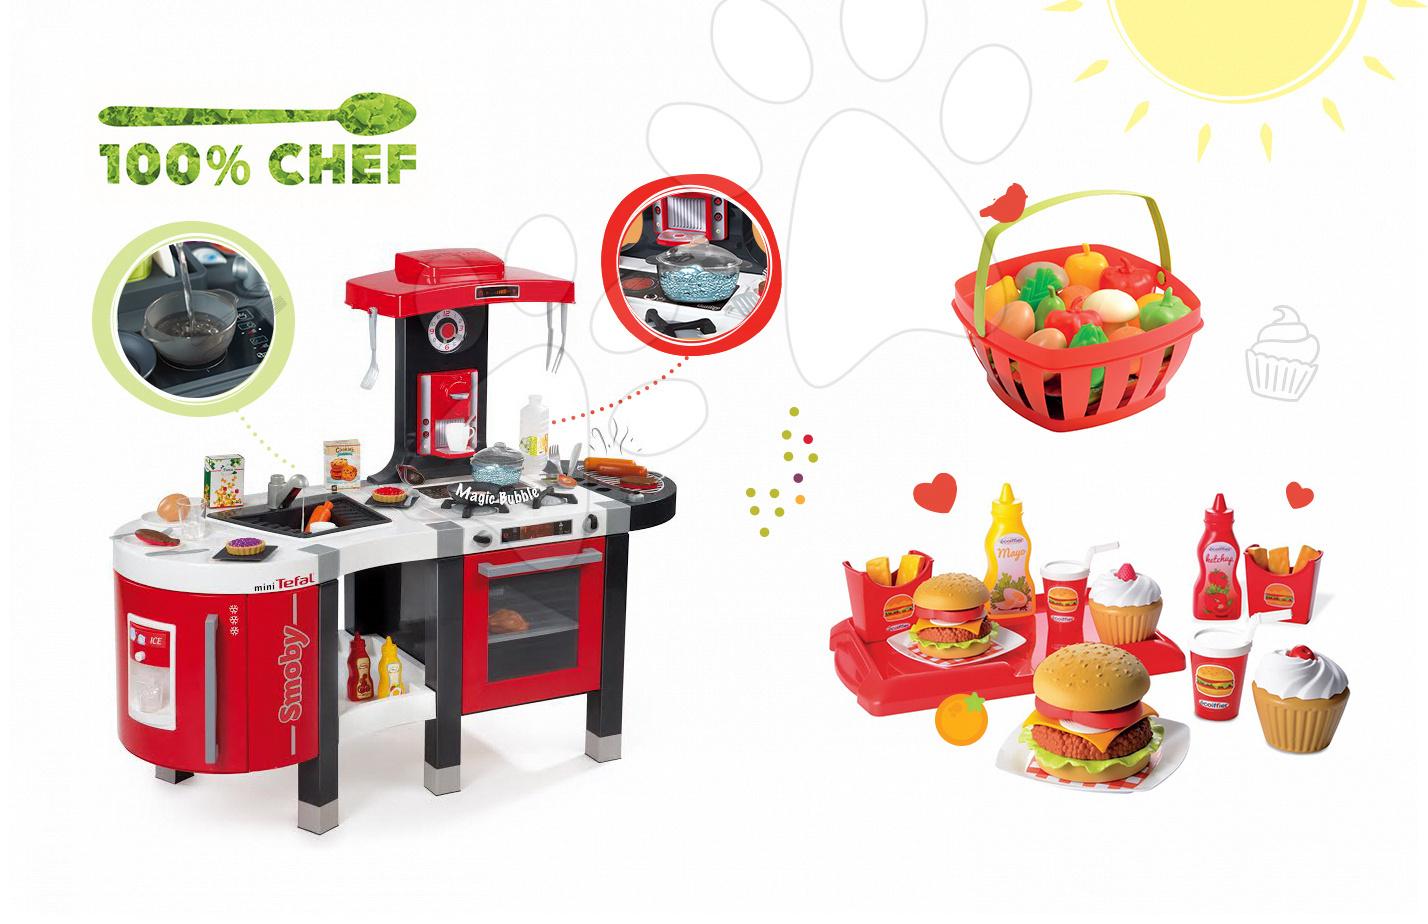 Kuchynky pre deti sety - Set kuchynka Tefal French Touch Bublinky&Voda Smoby s magickým bublaním, hamburger set a košík s potravinami